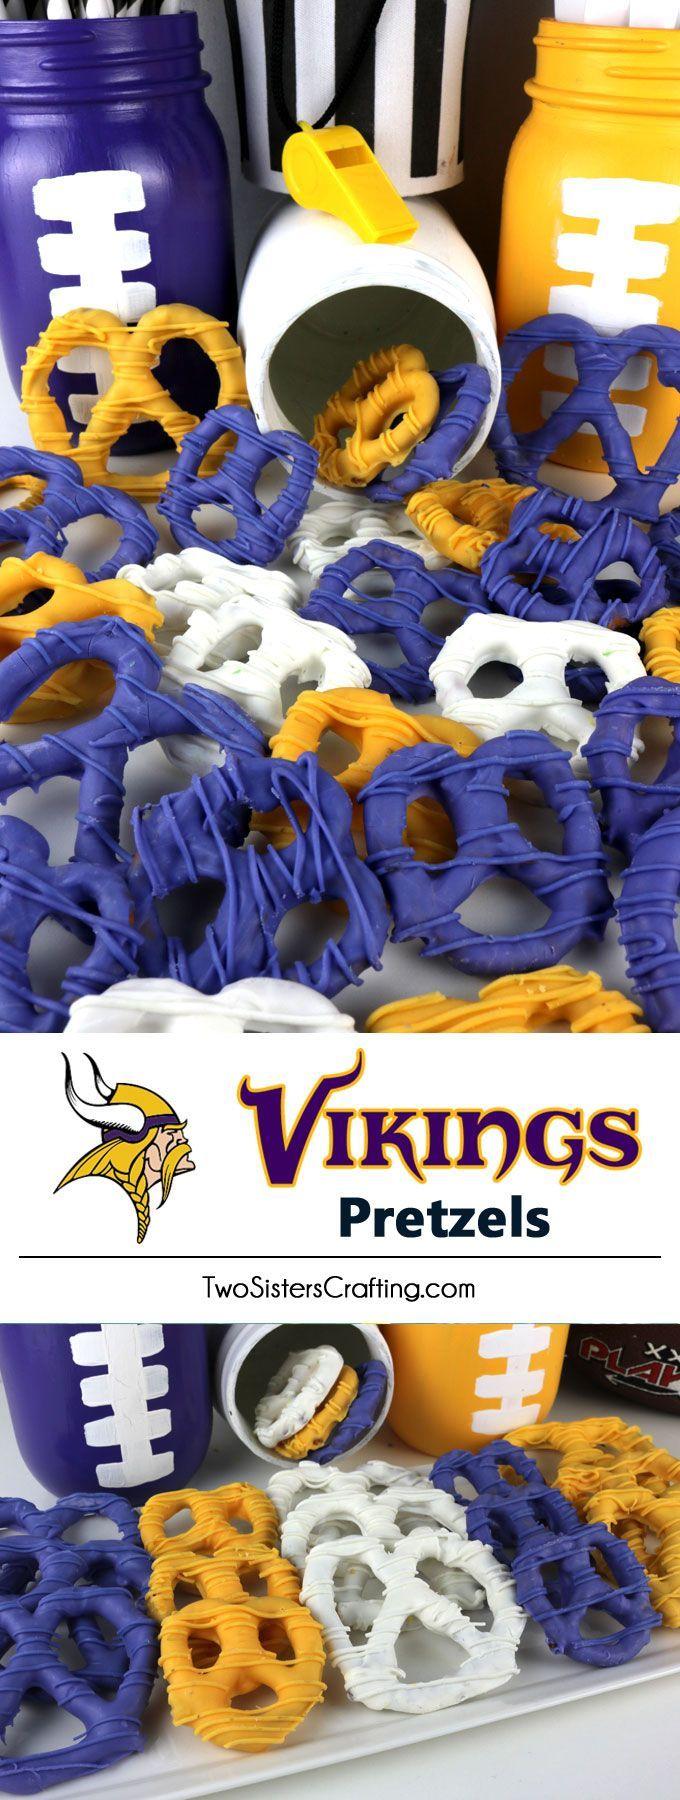 Minnesota Vikings Pretzels #footballfood